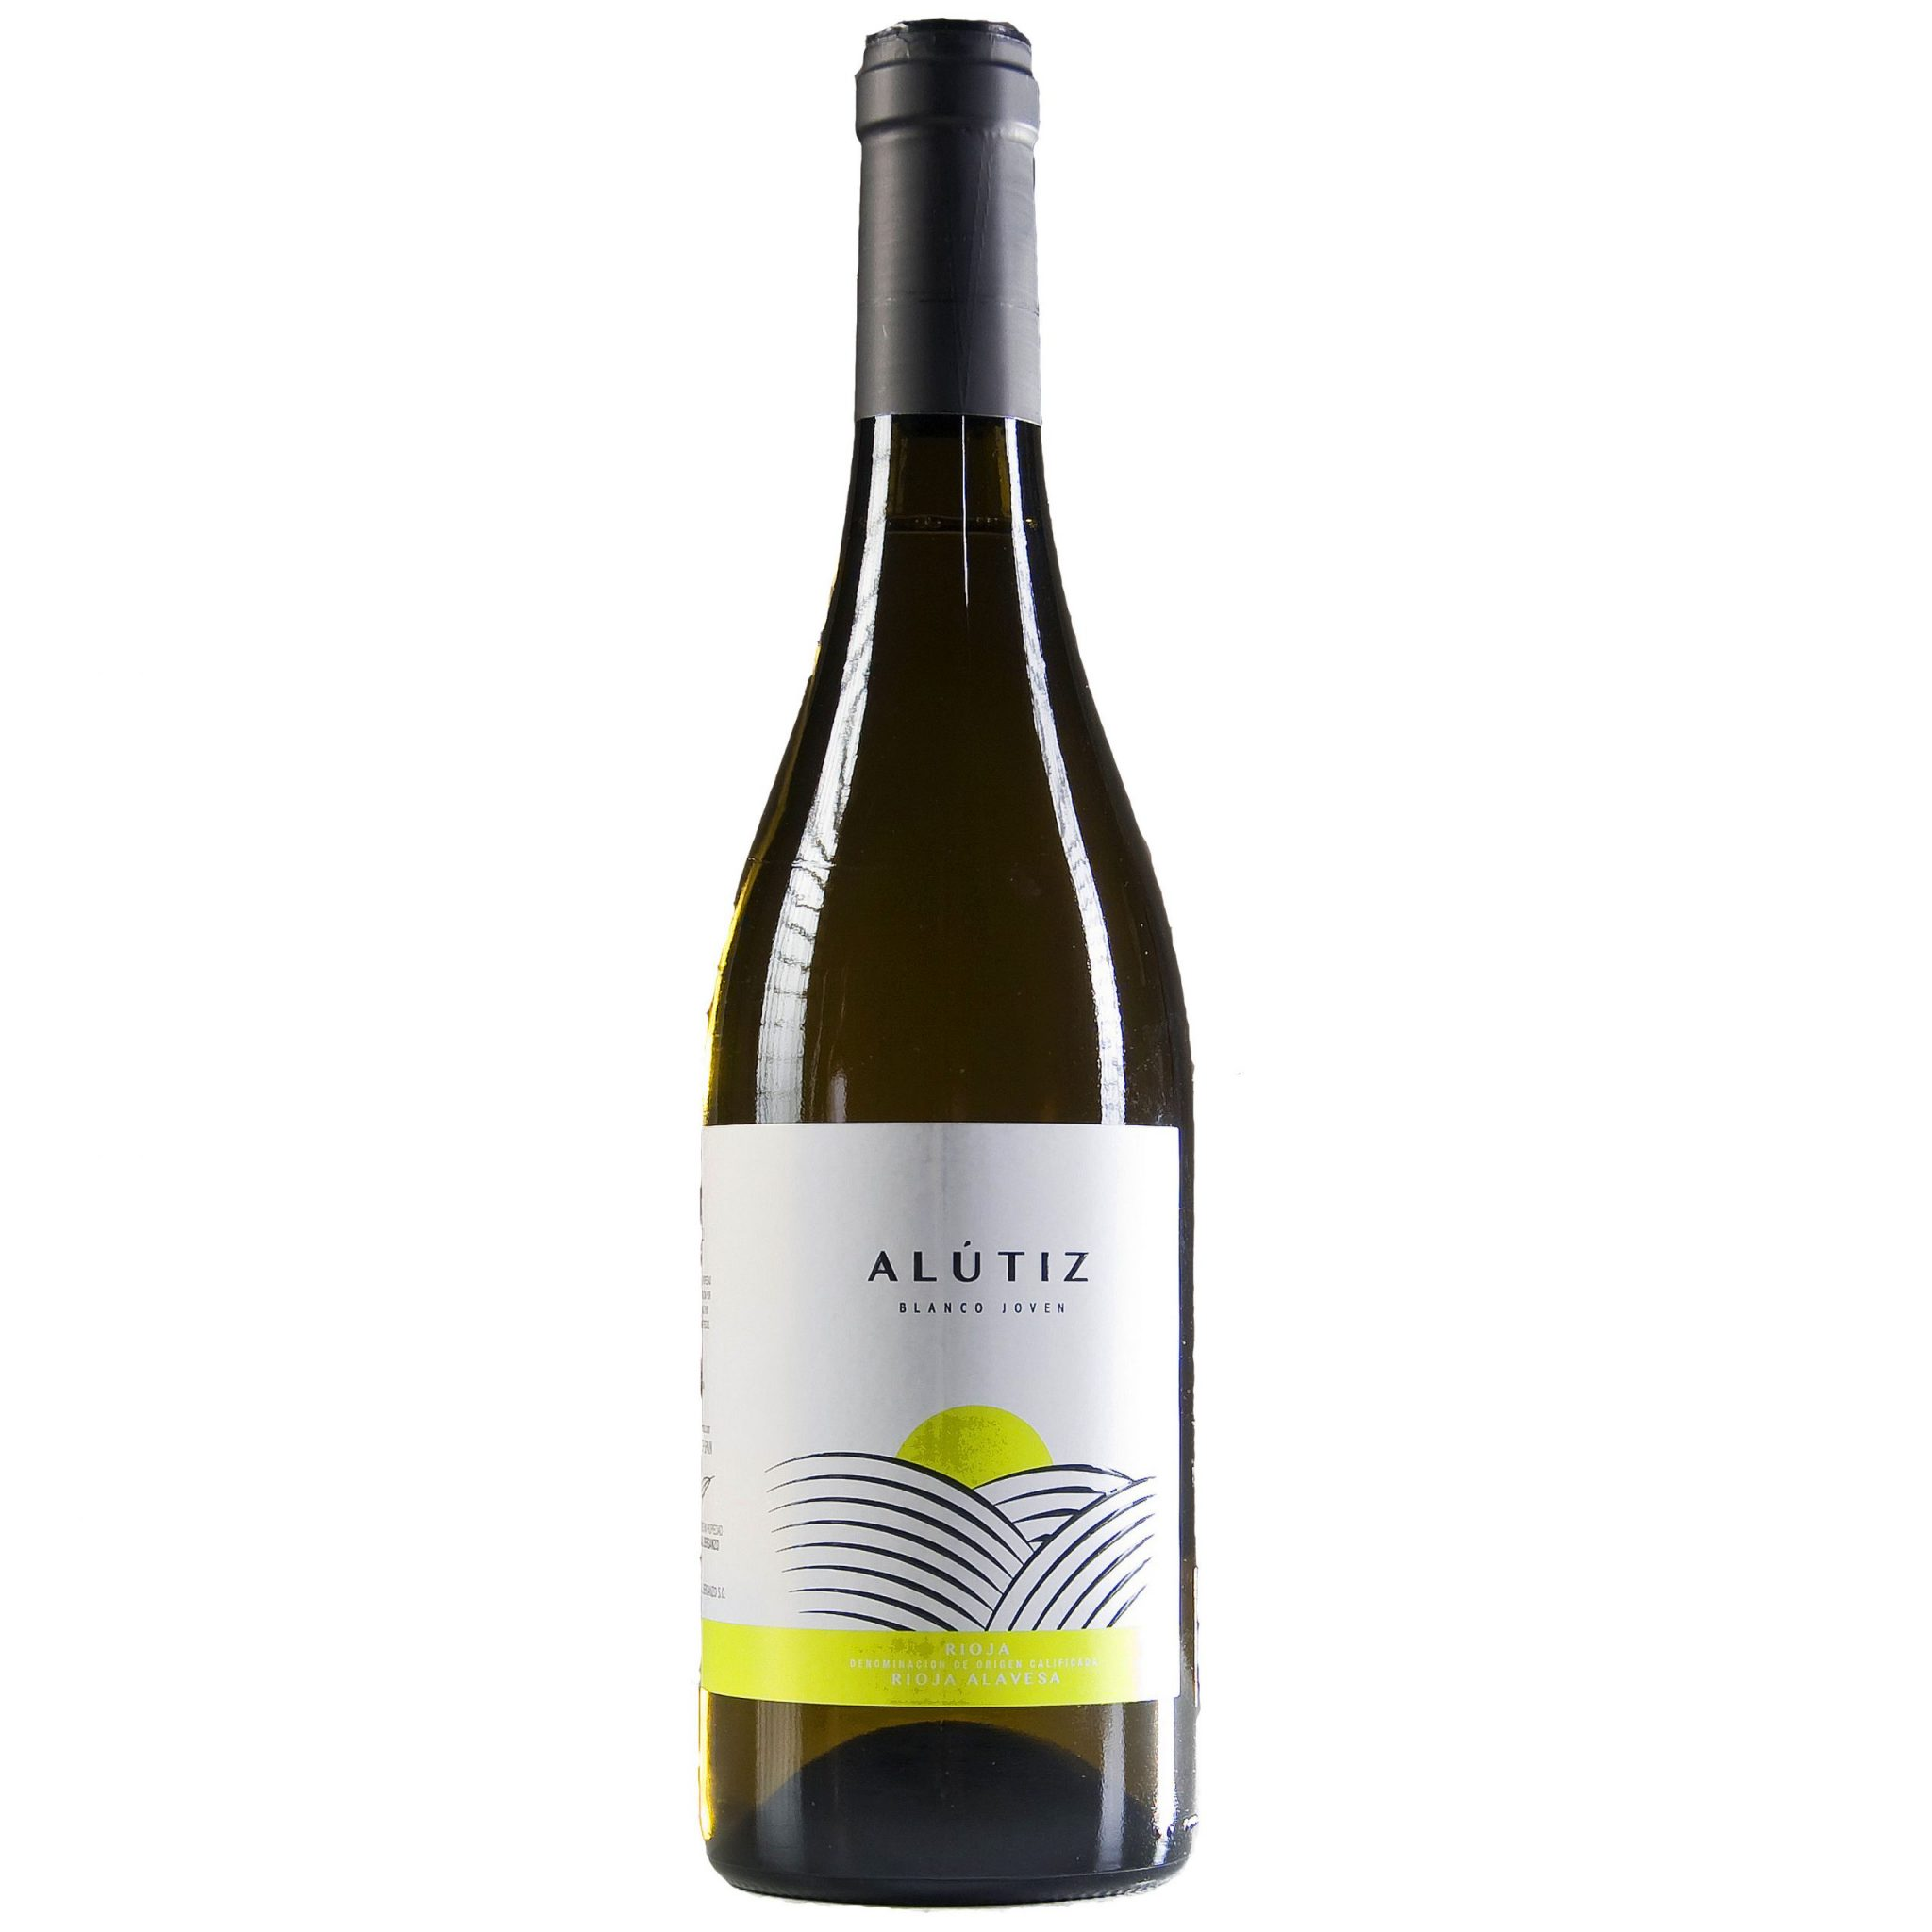 comprar vino blanco joven la rioja online